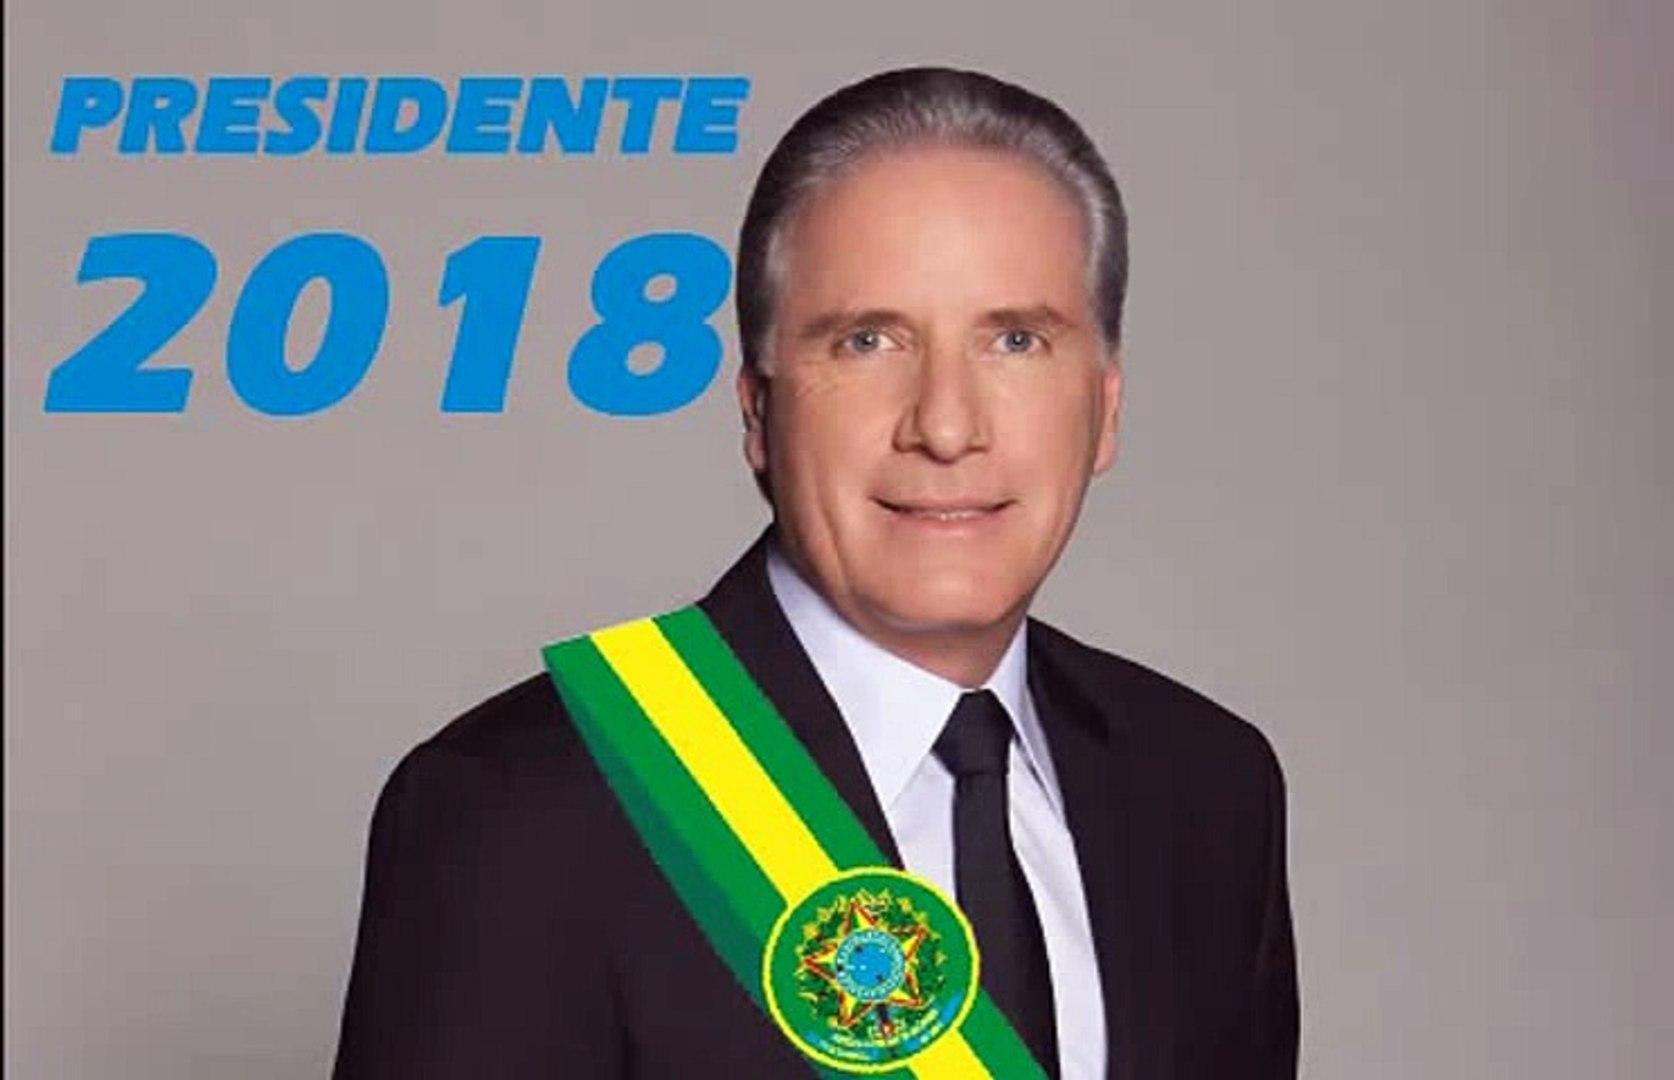 ROBERTO JUSTUS CANDIDATO A PRESIDENTE 2018 NO BRASIL